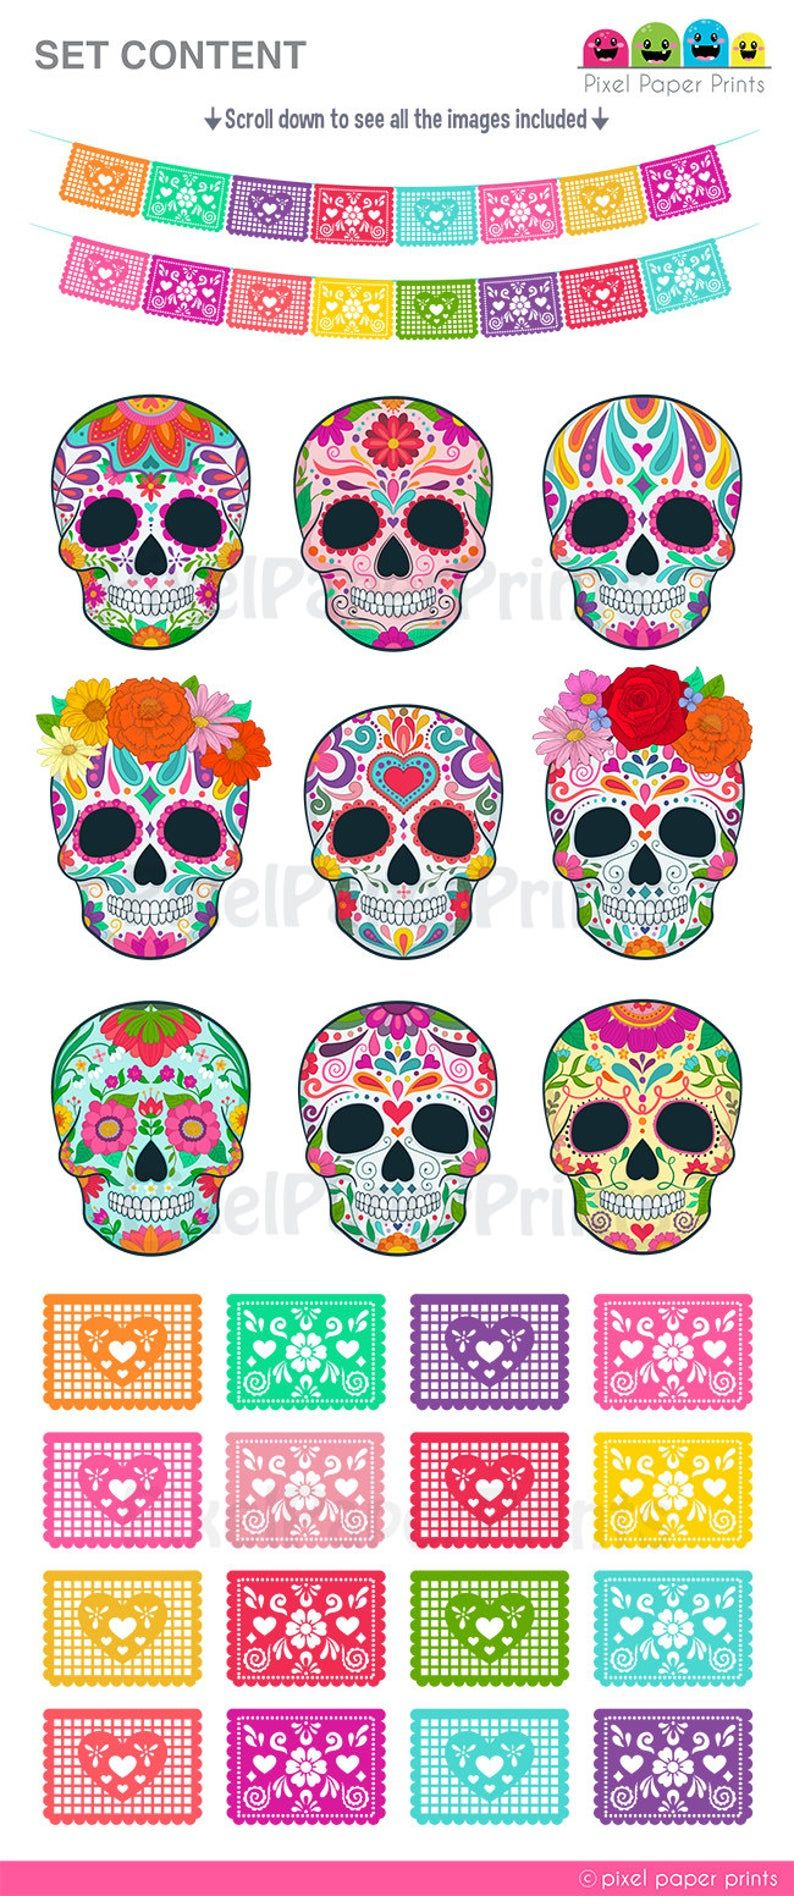 Day Of The Dead Clipart Sugar Skull Dia De Los Muertos Clip Art Digital Download In 2020 Clip Art Digital Sticker Print Planner